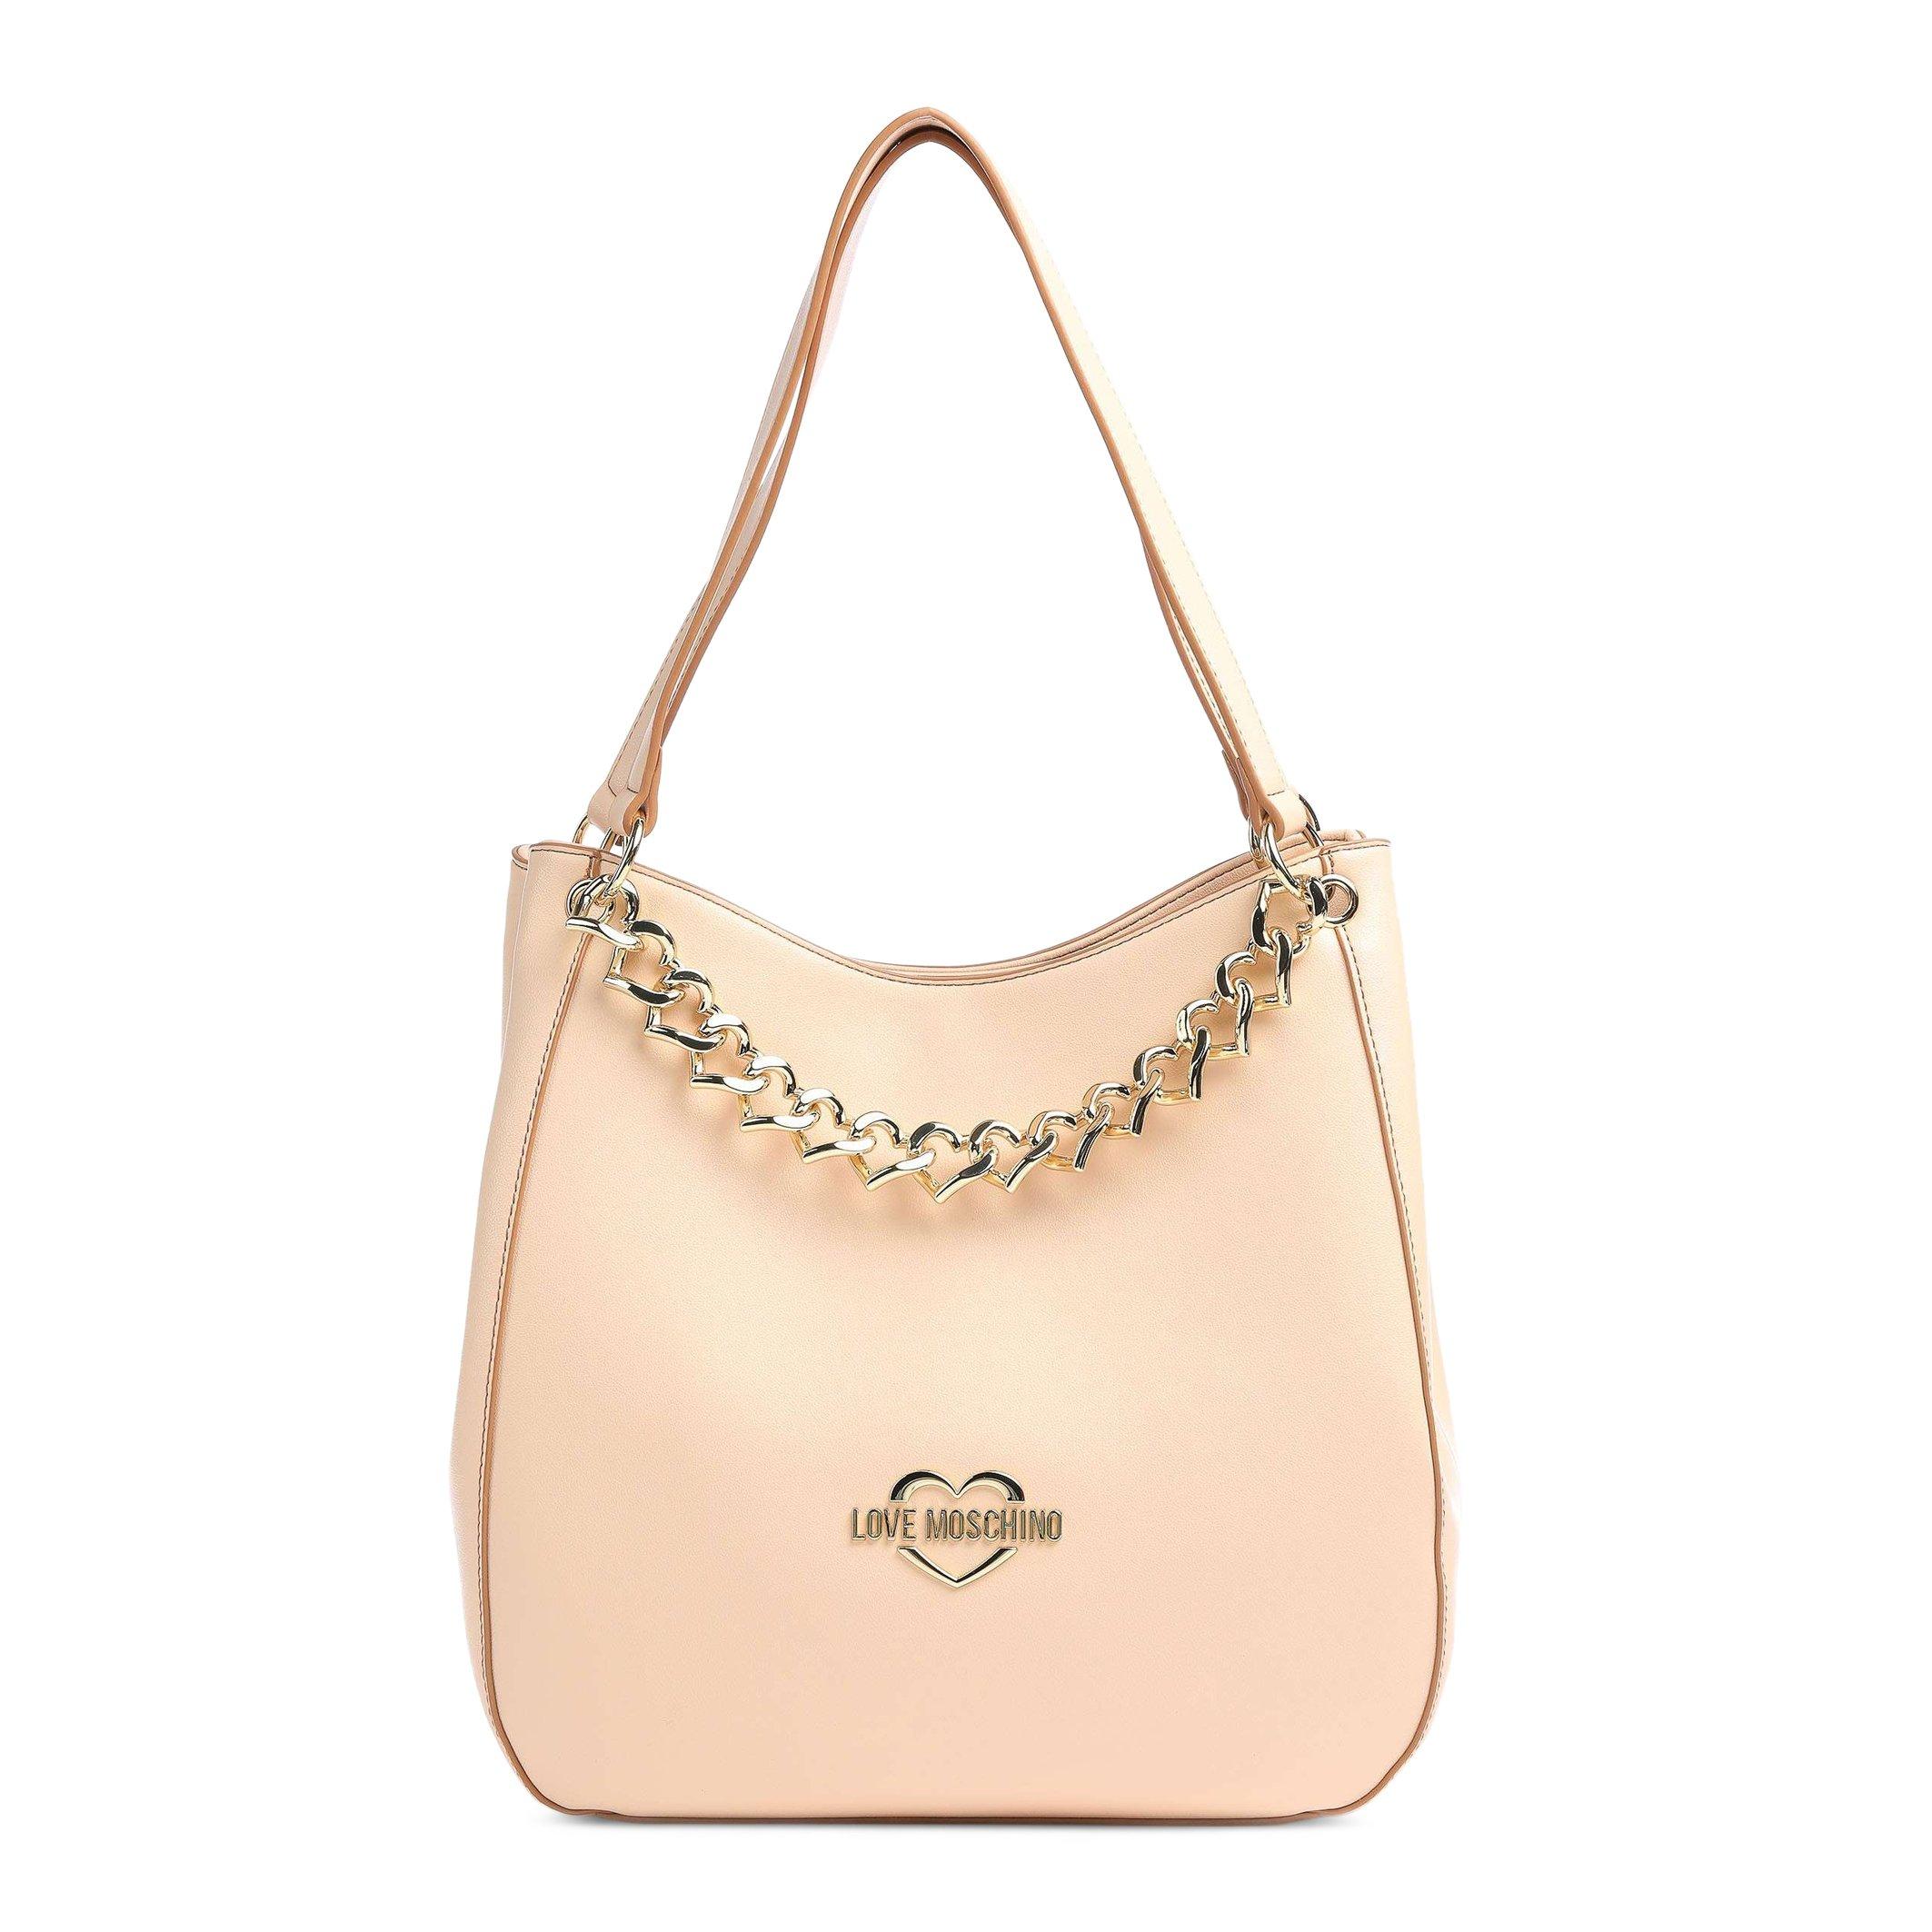 Love Moschino Women's Shoulder Bag Various Colours JC4198PP1DLK0 - brown NOSIZE